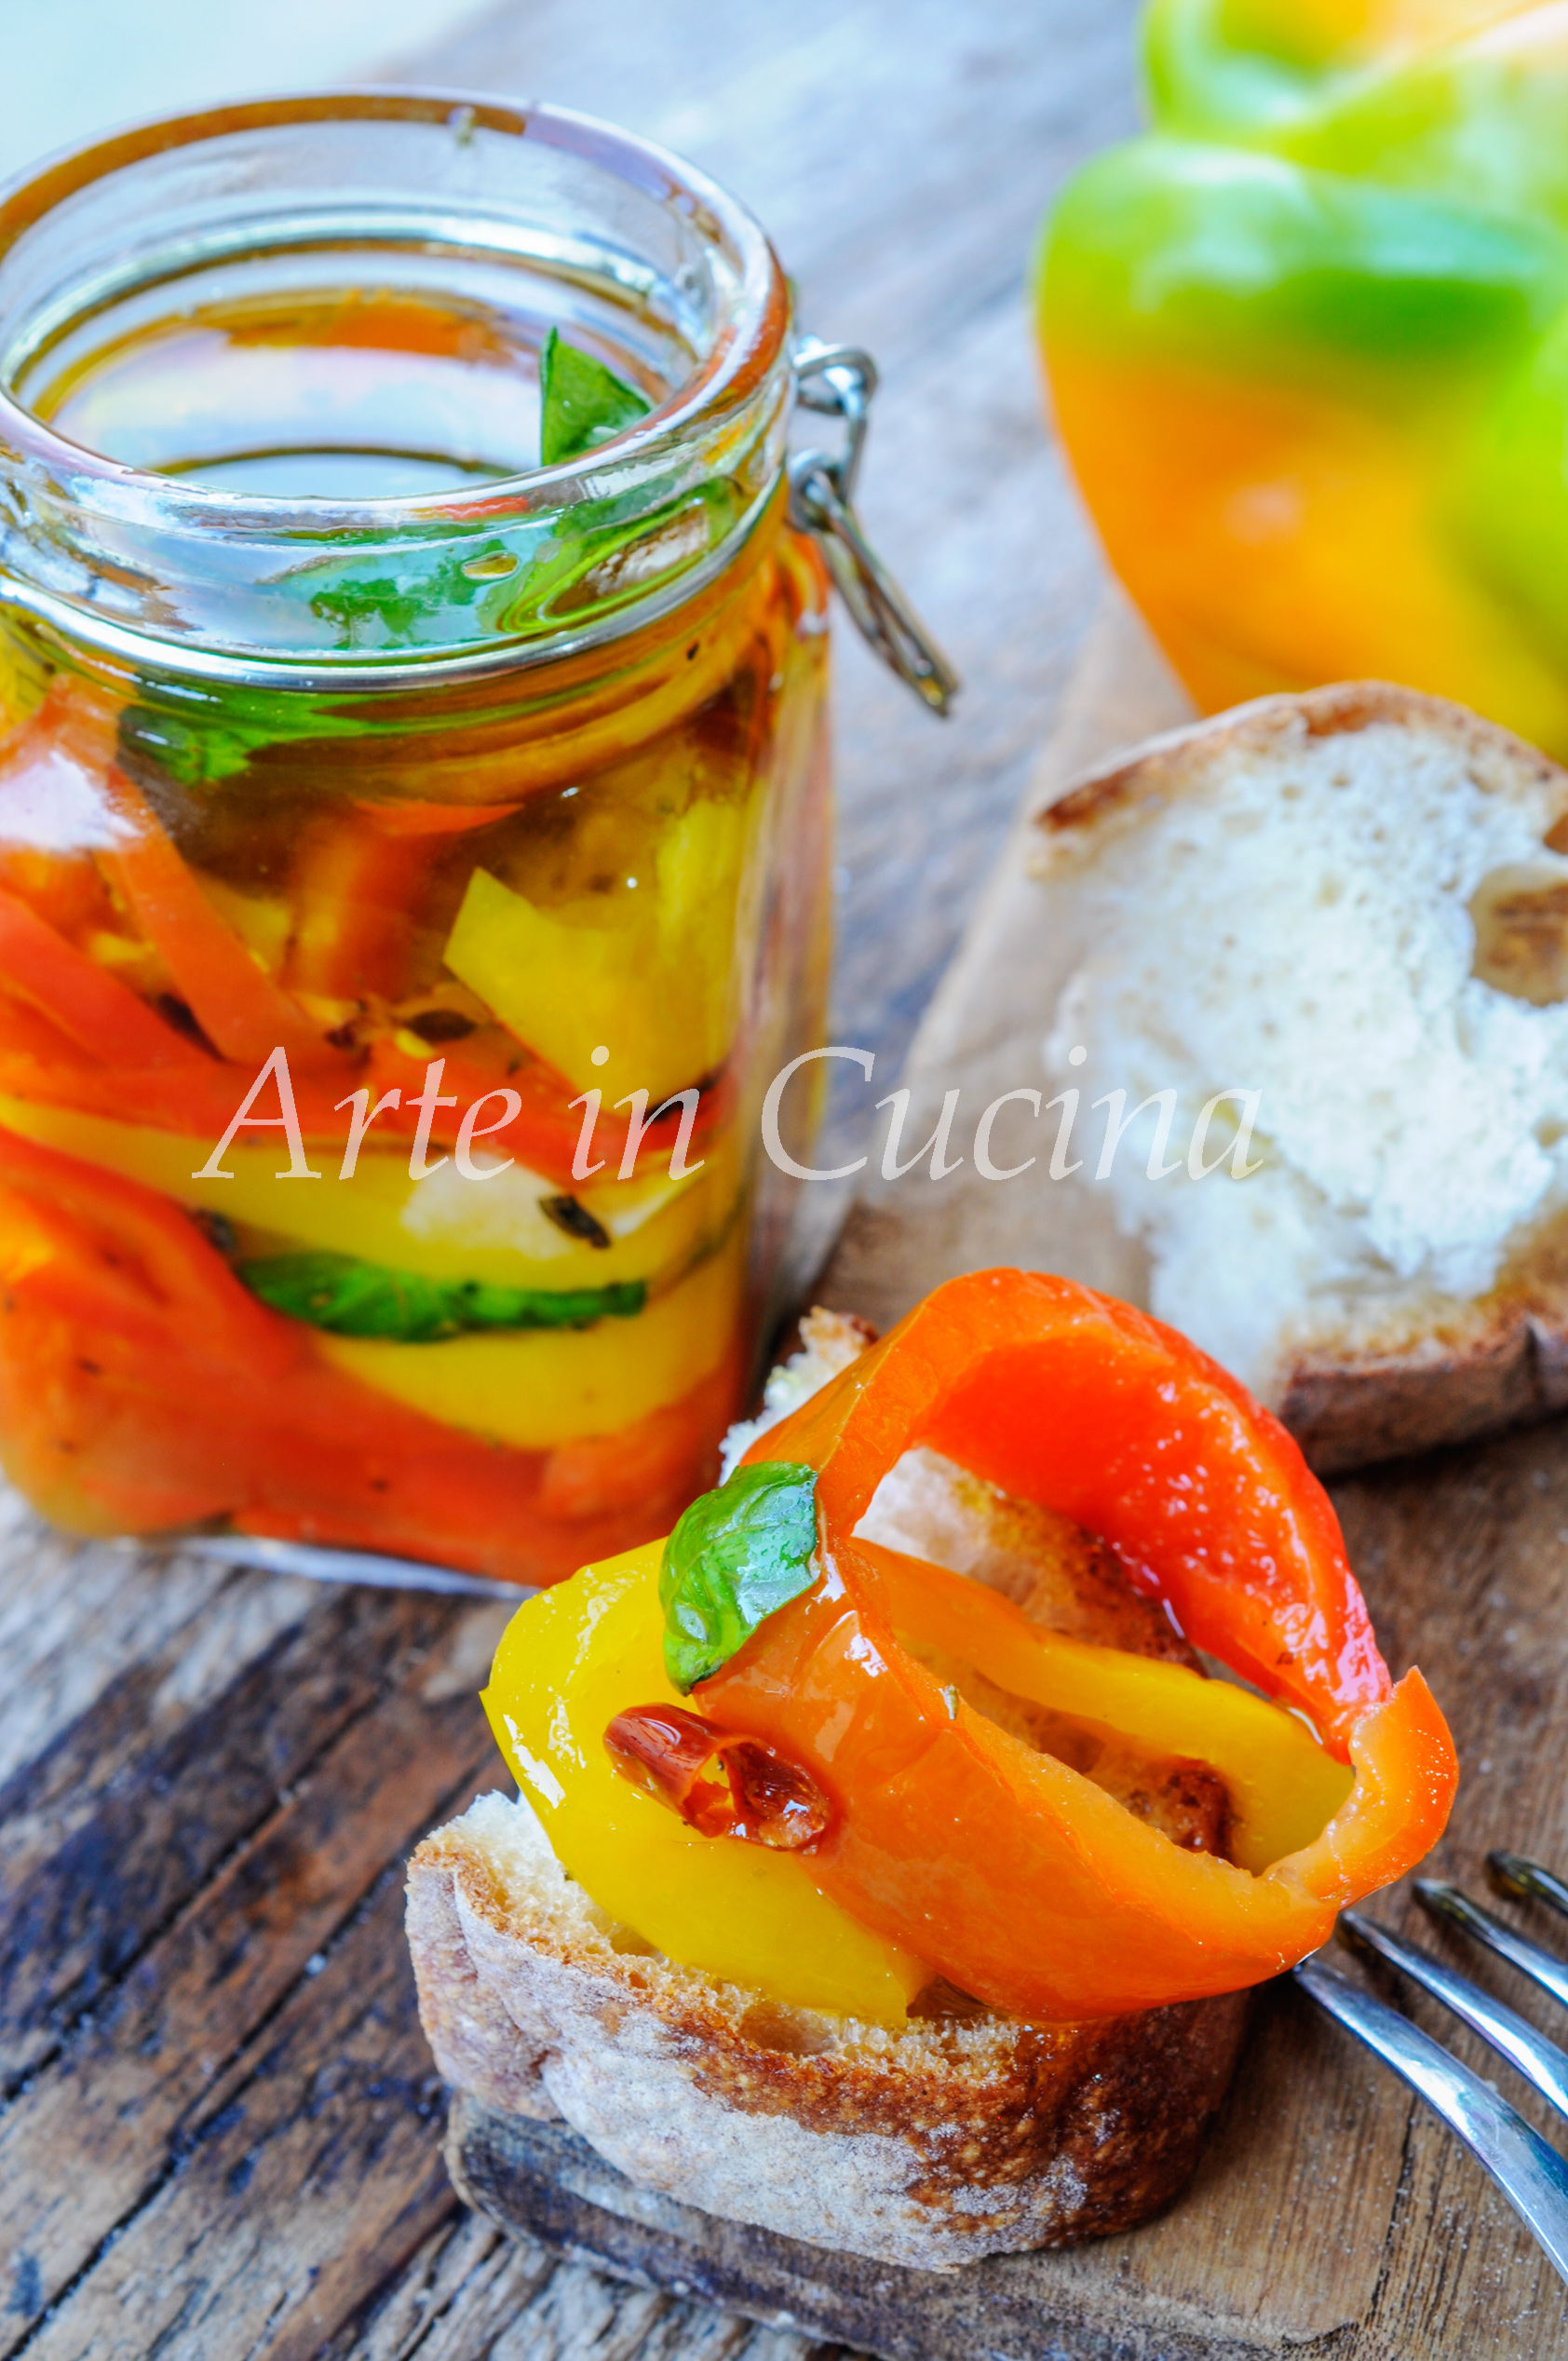 Peperoni sott 39 olio ricetta conserva facile arte in cucina for Cucina facile ricette